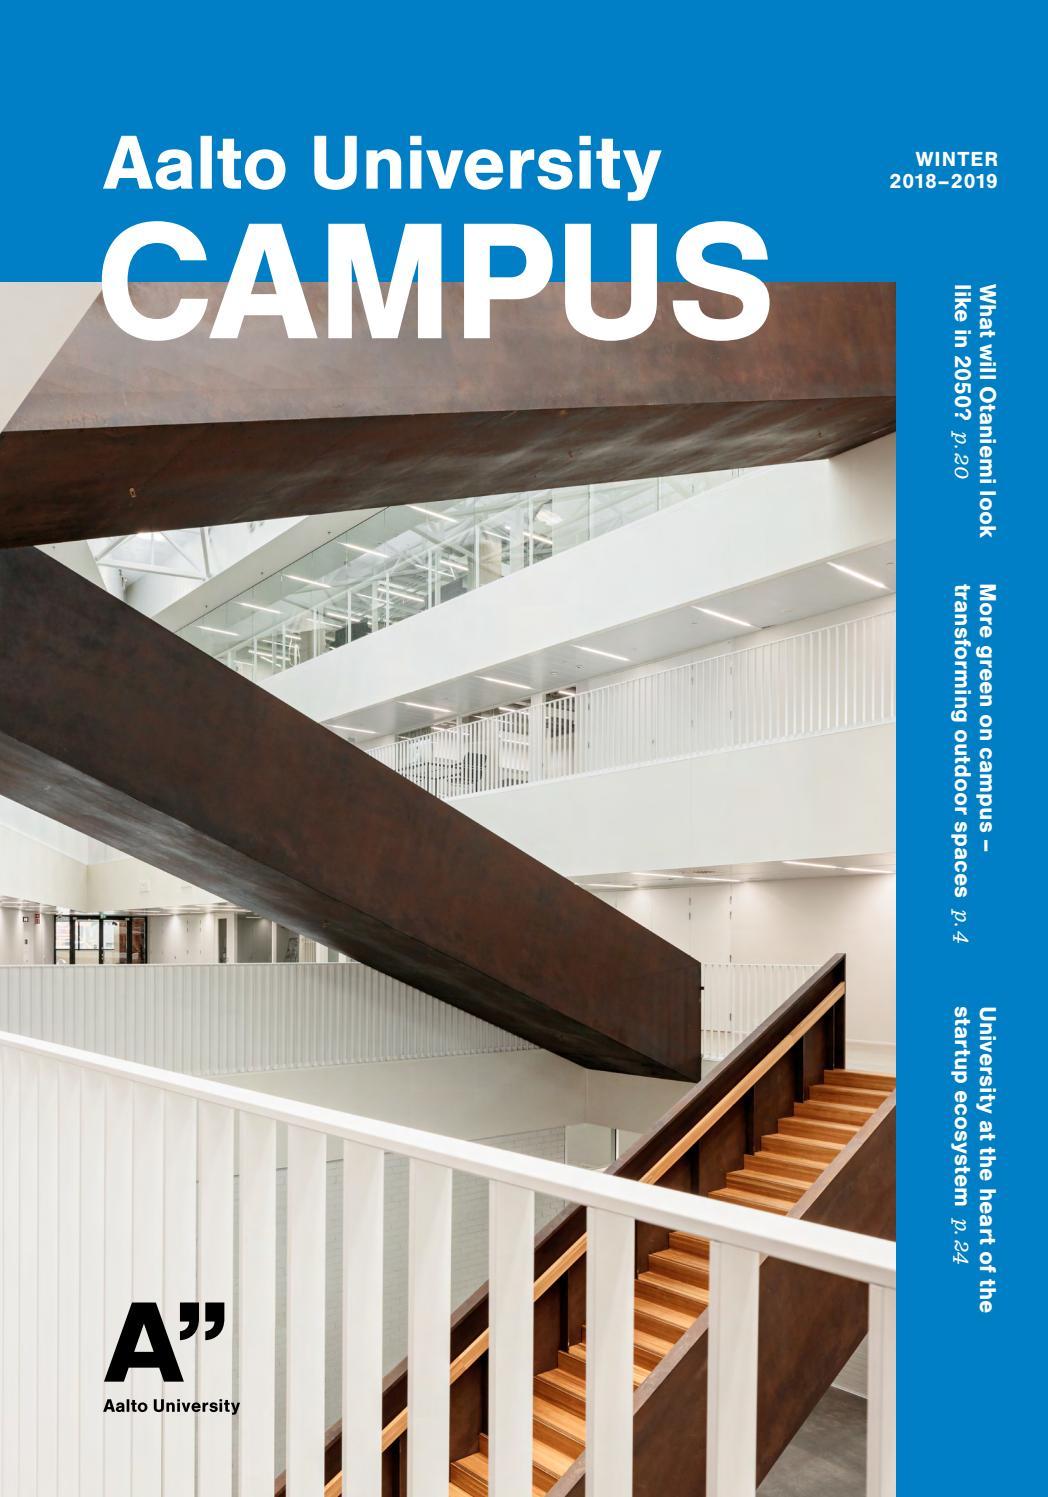 Aalto University Campus By Aalto University Issuu